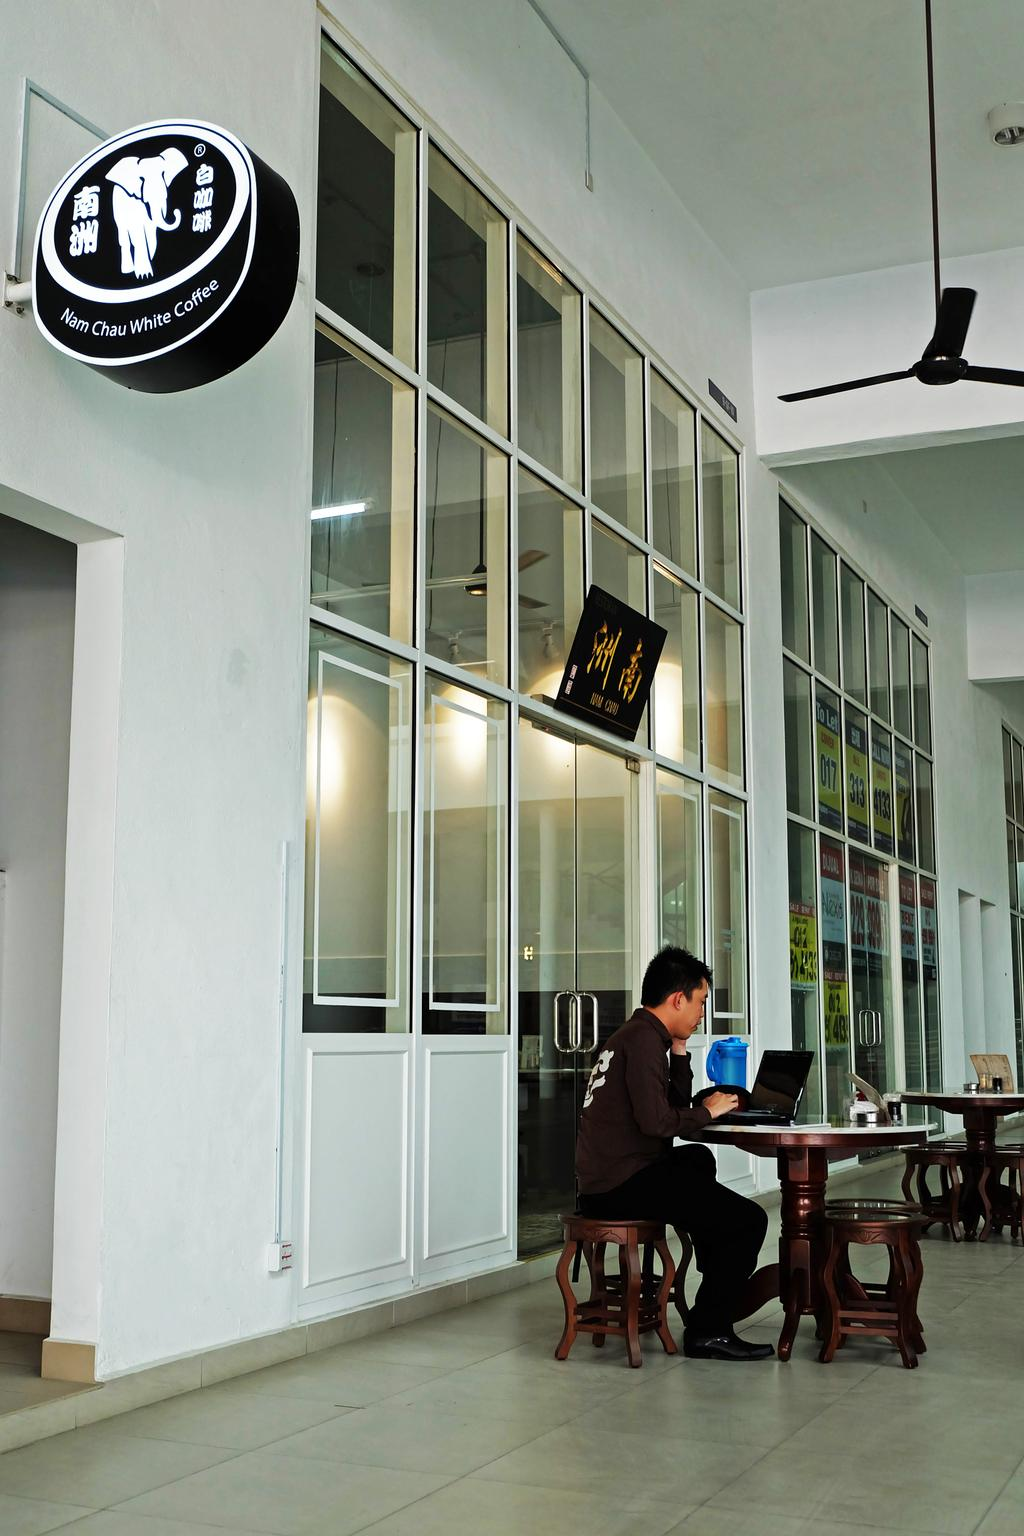 Nam Chau, Nexis Sunway Damansara, Commercial, Interior Designer, Spazio Design Sdn Bhd, Traditional, Human, People, Person, Logo, Trademark